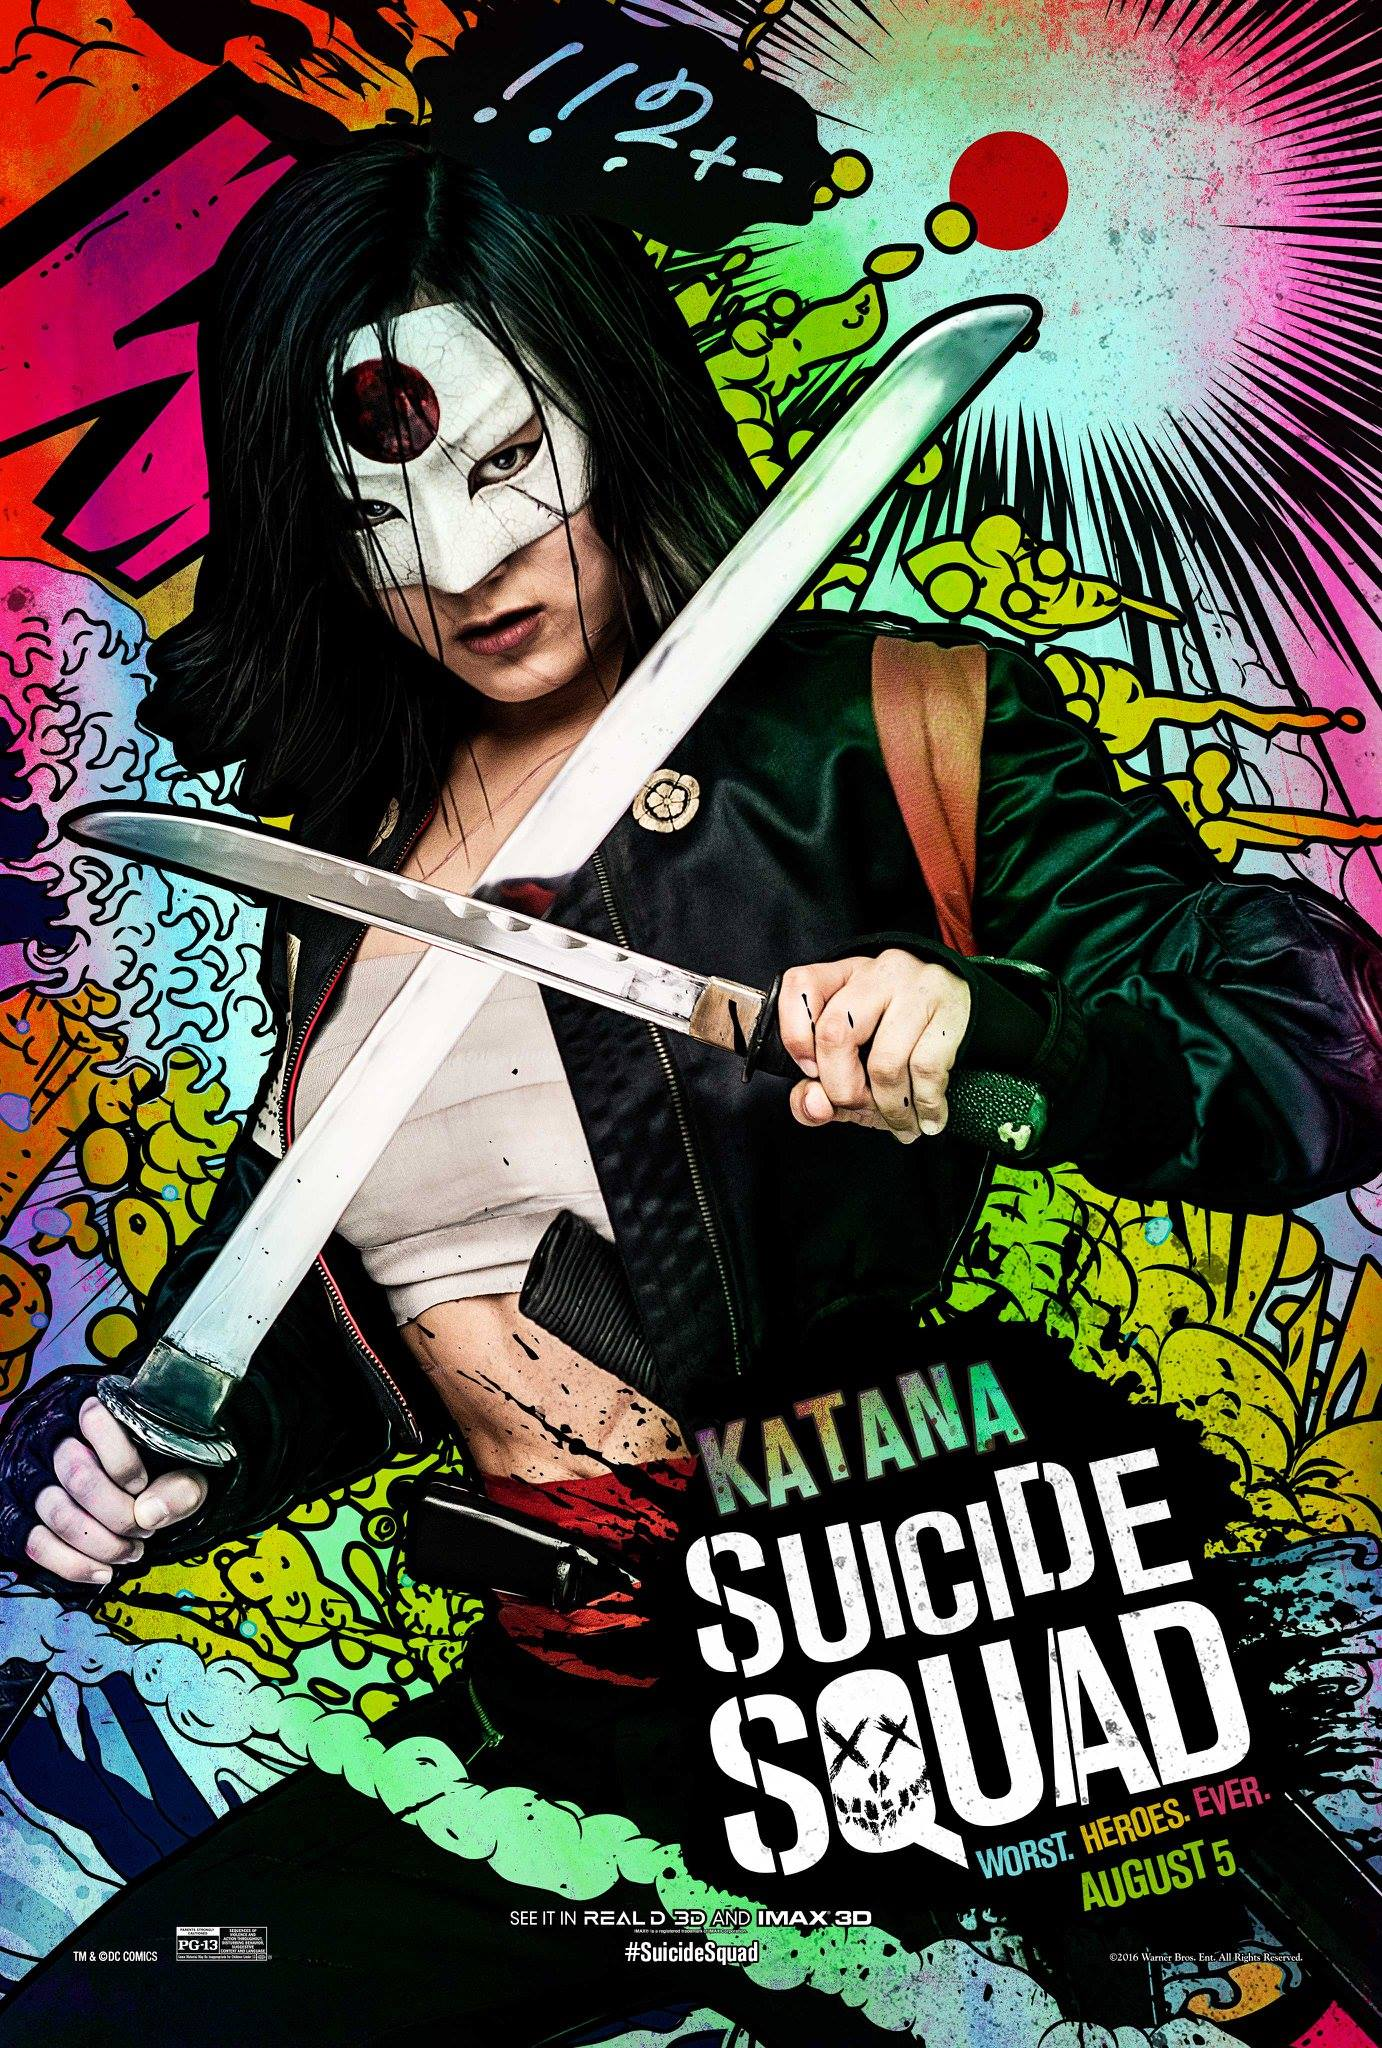 Suicide Squad Katana